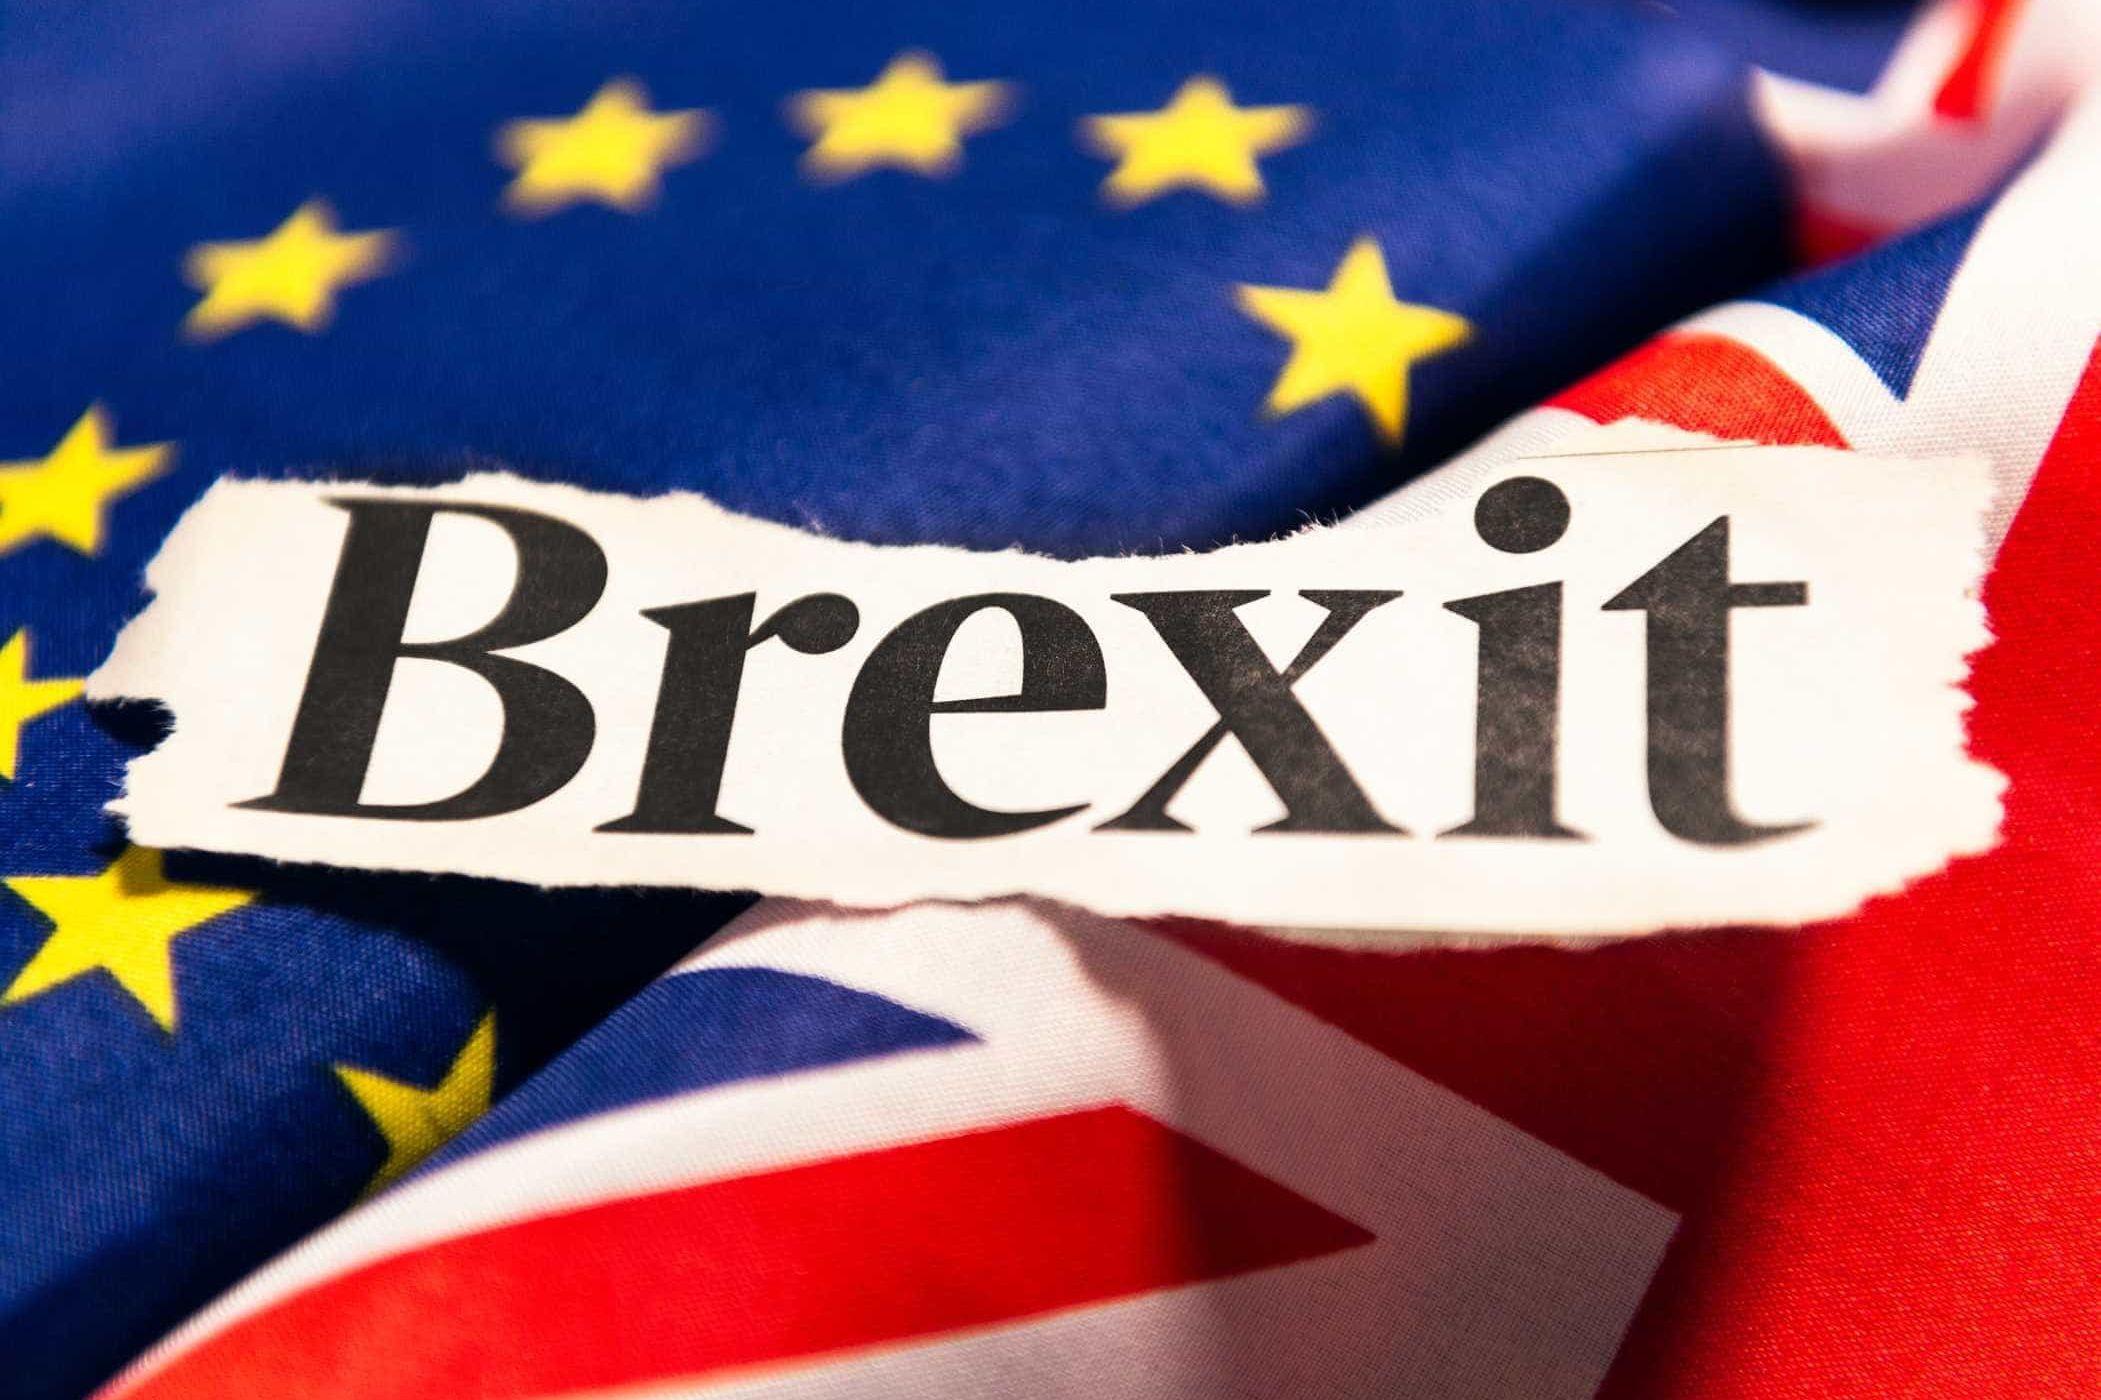 Brexit: fracasso seria 'ferida aberta' na sociedade britânica